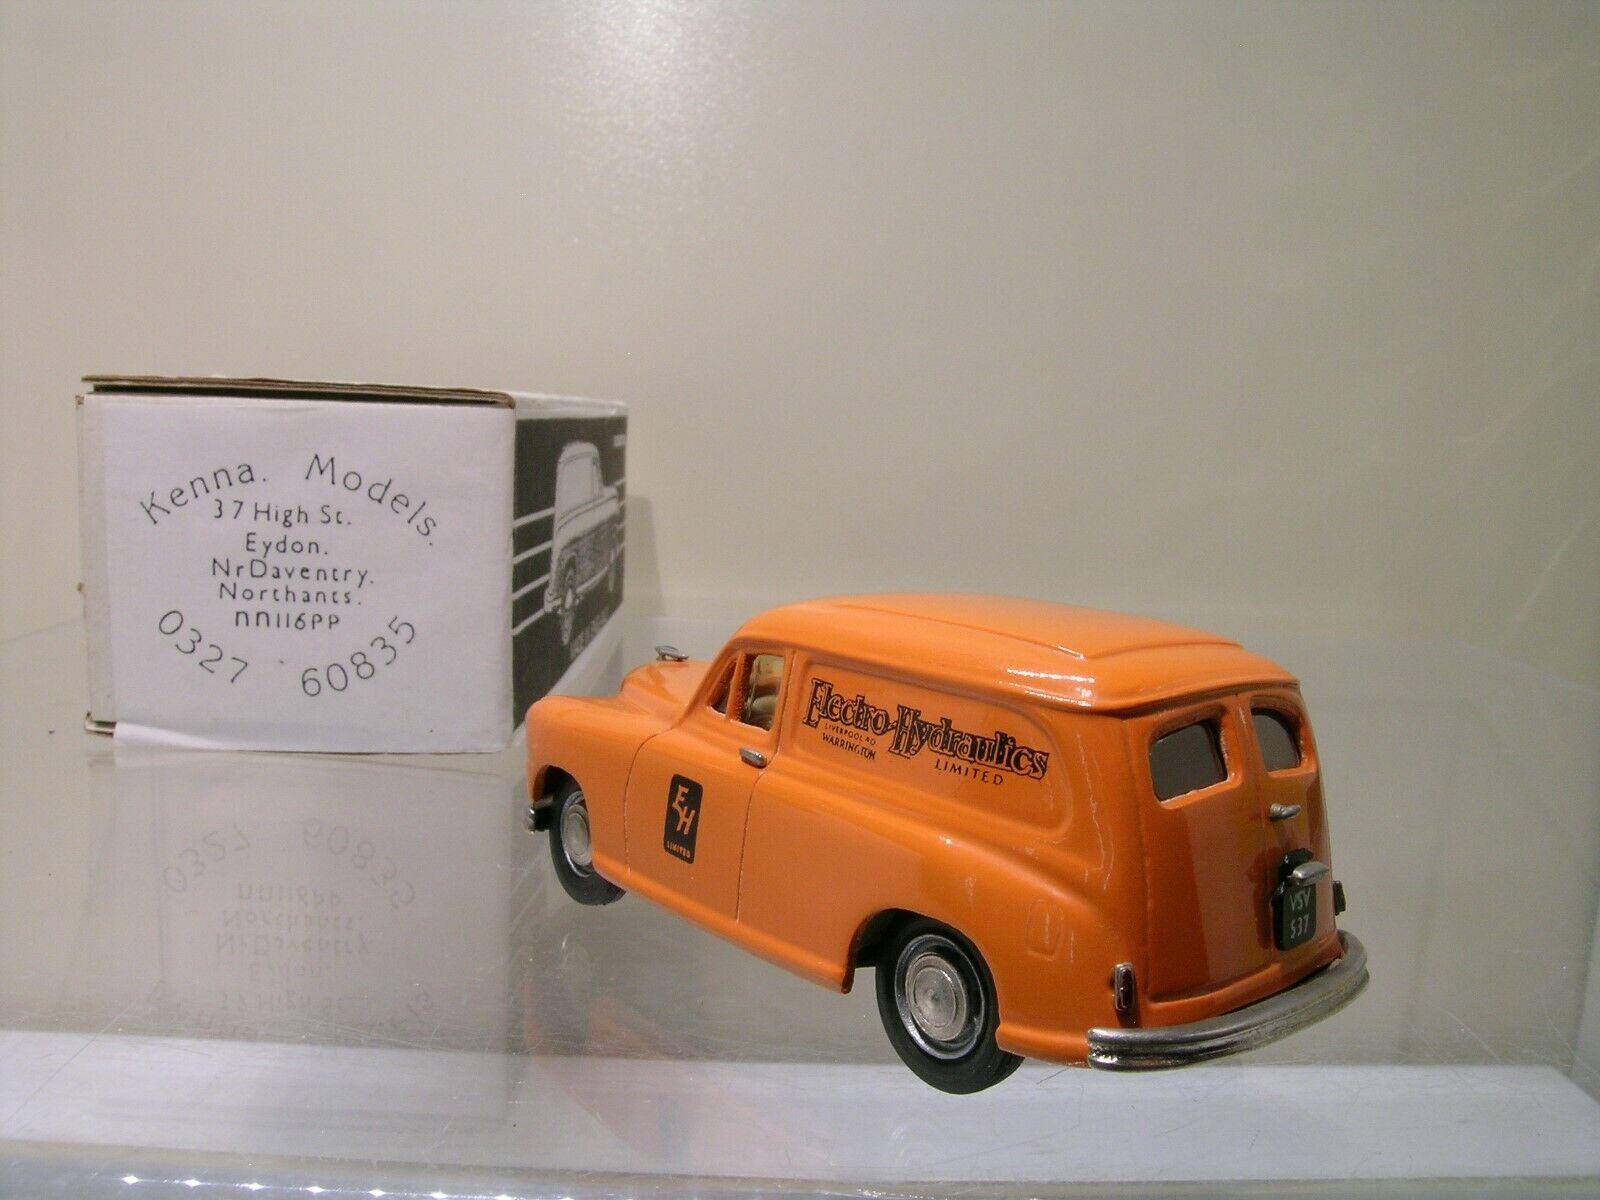 KENNA modelloS STeARD VANGUARD VAN VAN VAN PHASE 2 ELECTRO HYDR.12 150 arancia 1953 1 43 addf58